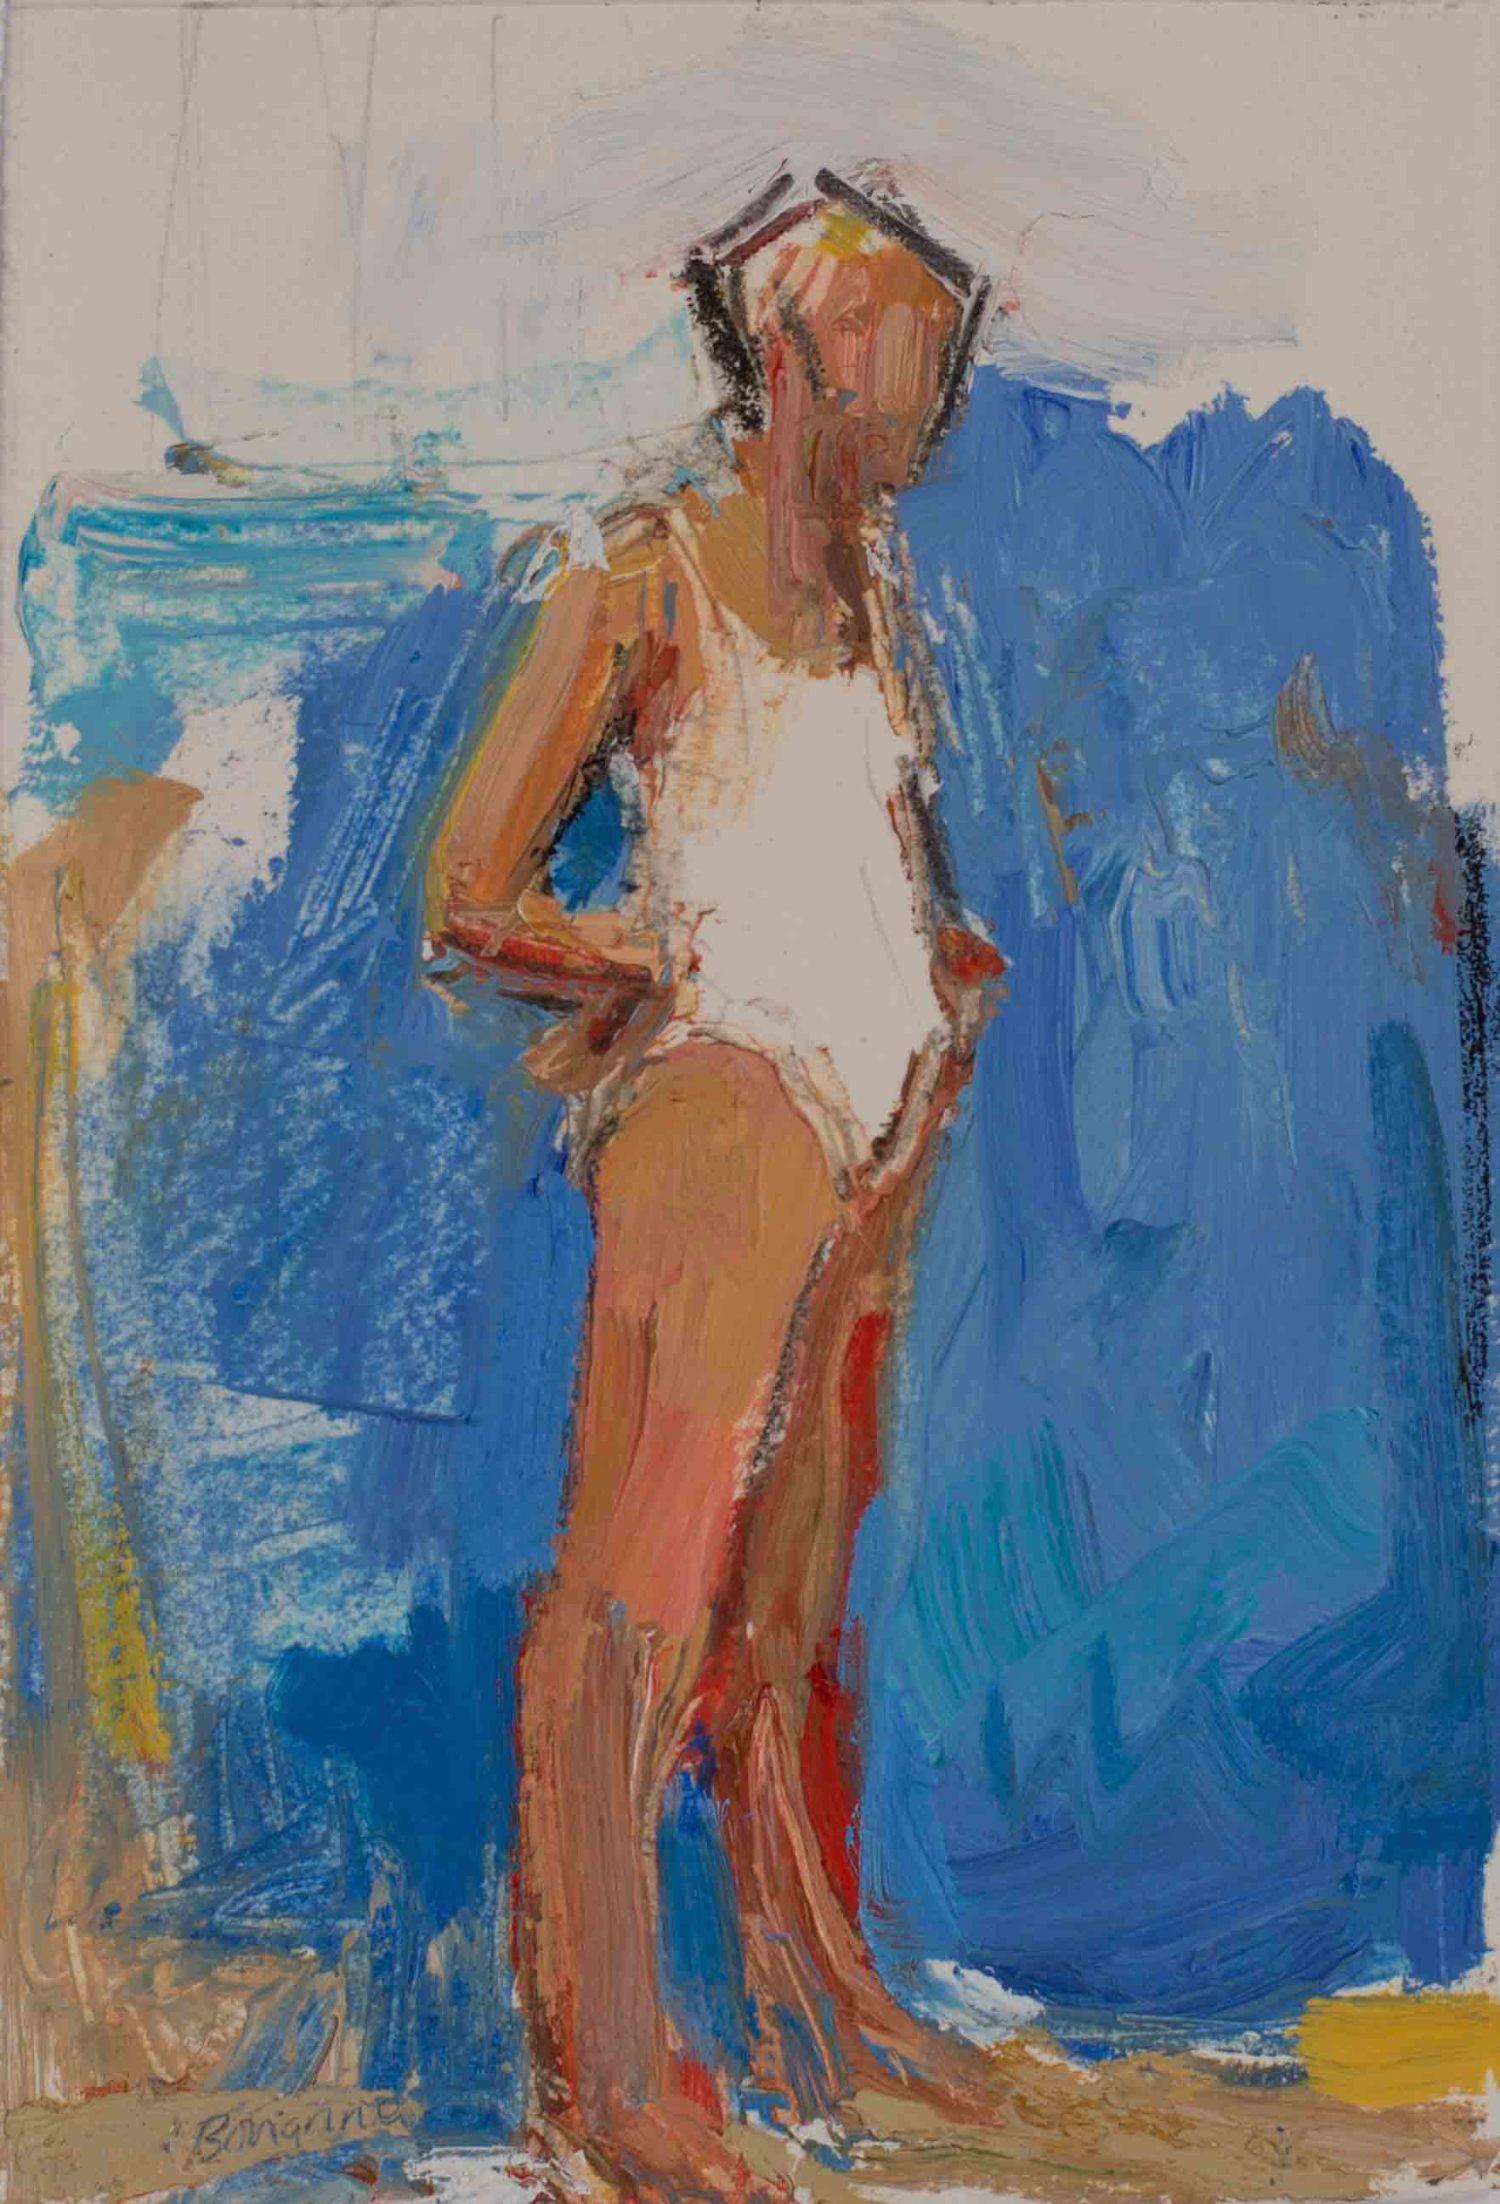 Contemporary Figurative Painting By Karen Bonanno